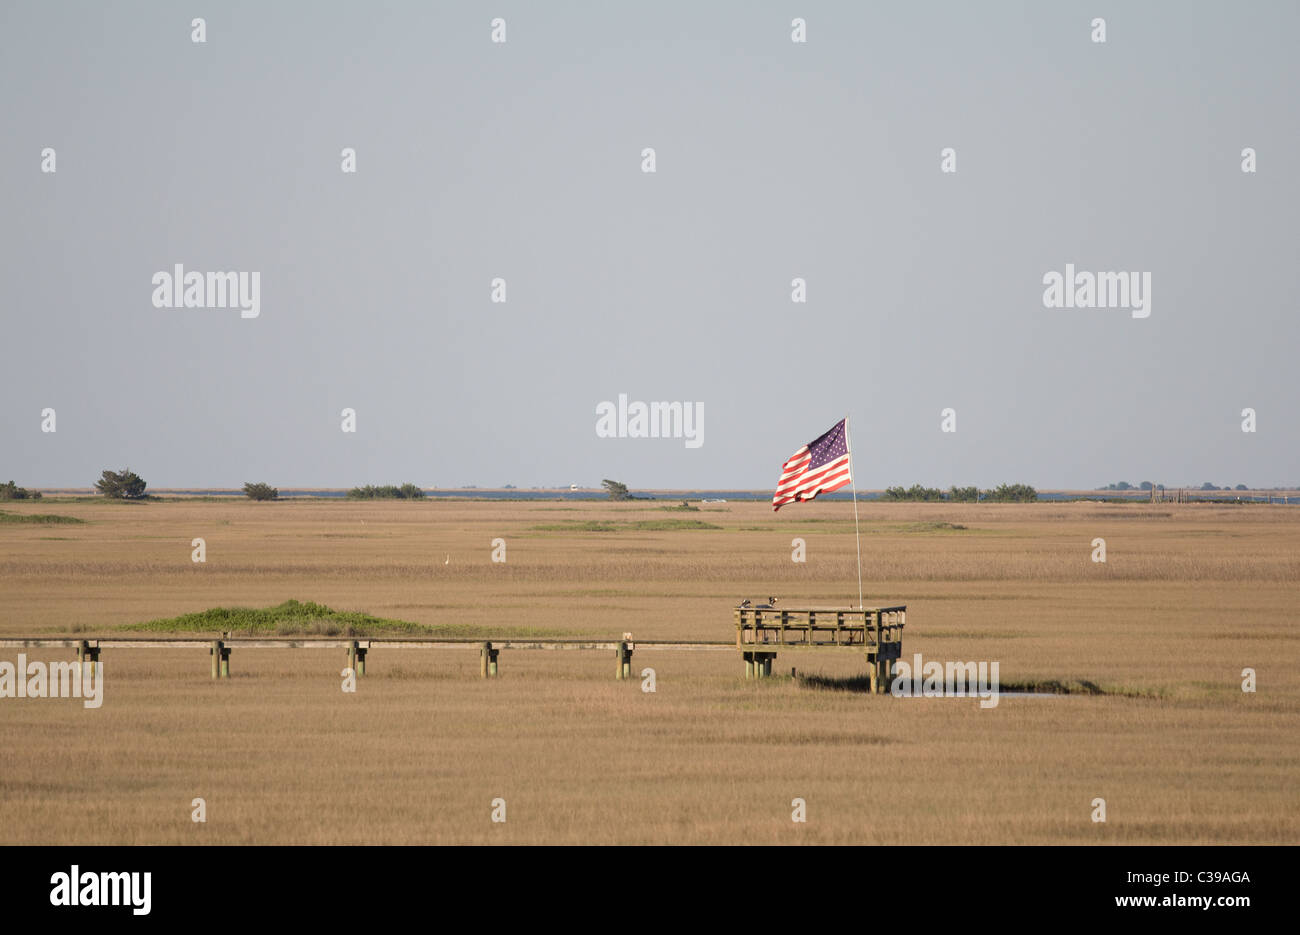 South Carolina salt marsh with pier and American flag - Stock Image